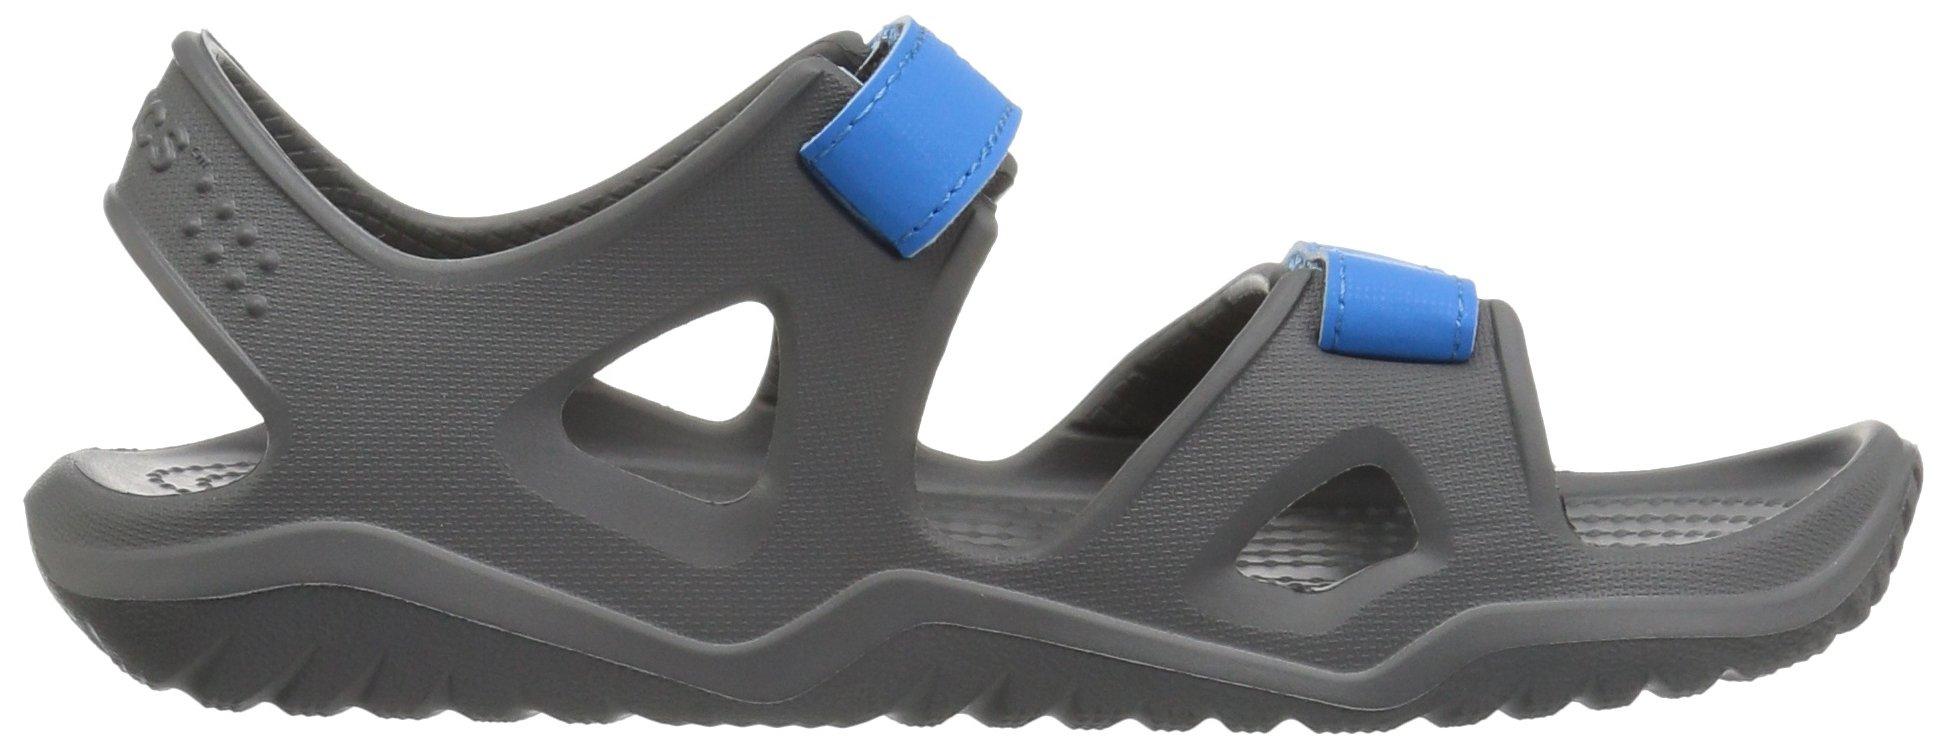 Crocs unisex-kids Swiftwater River Sandal Sandal, Slate Grey/Ocean, 2 M US Little Kid by Crocs (Image #7)